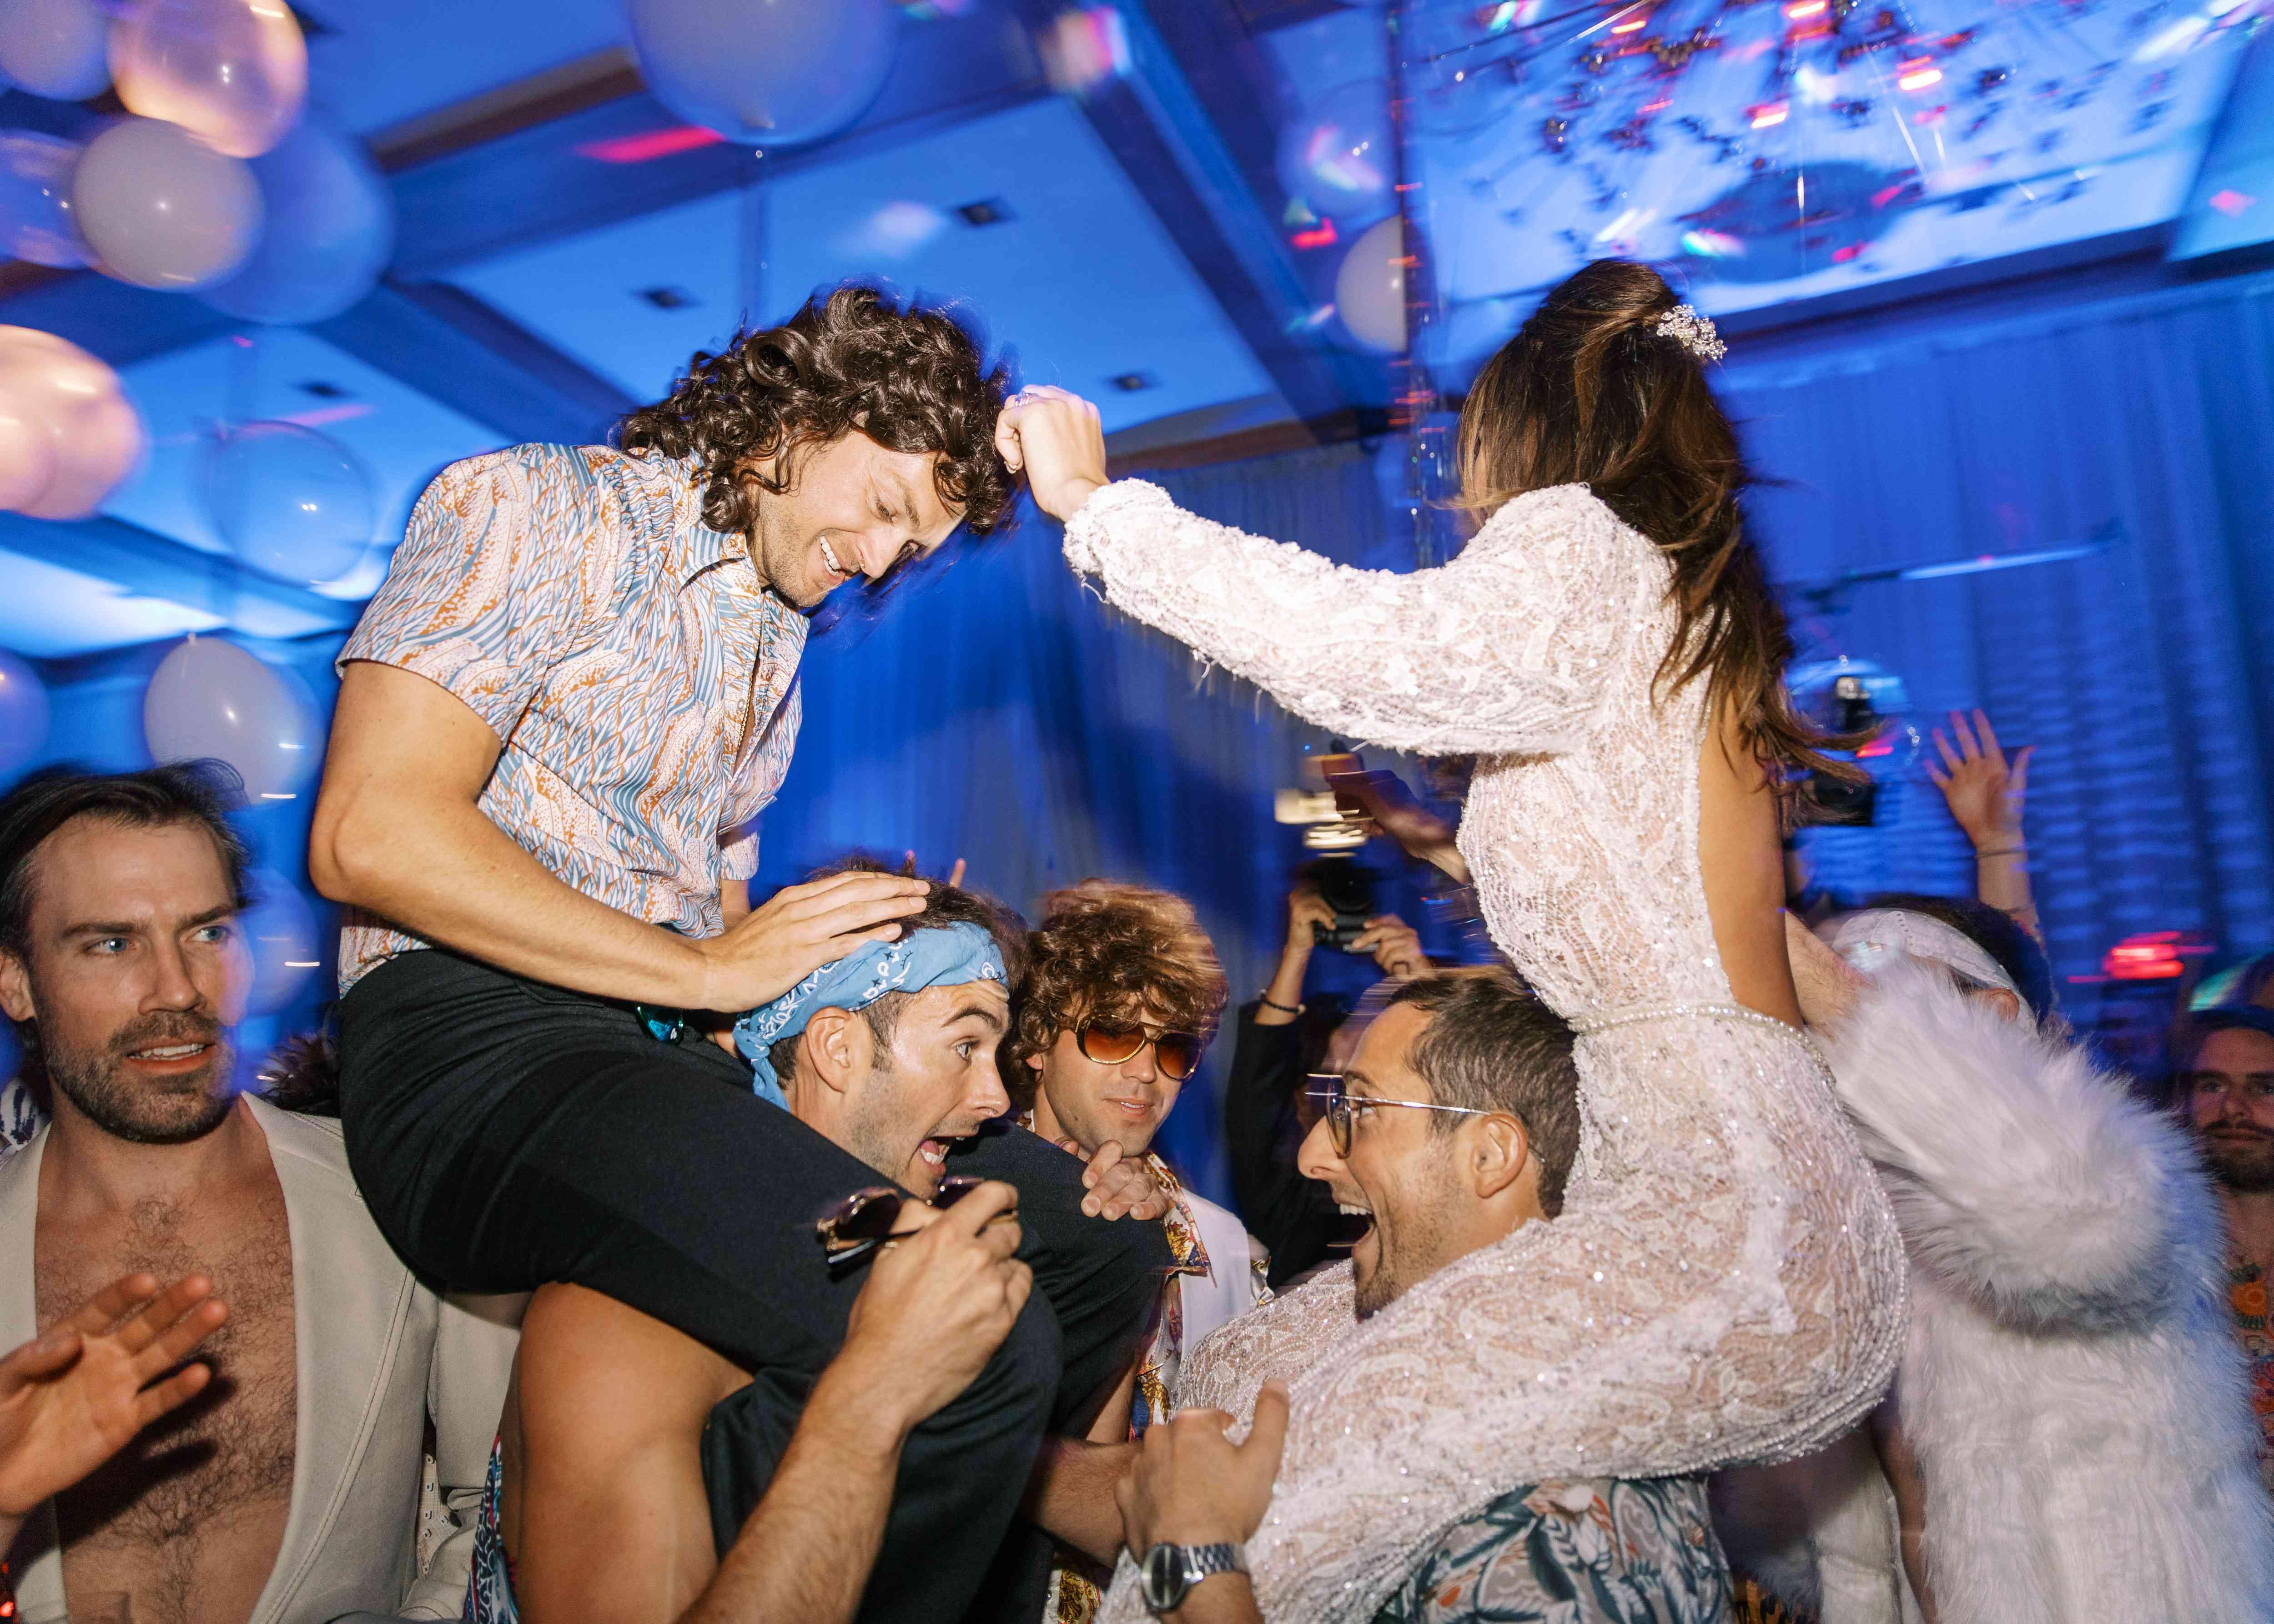 bride and groom on friends' shoulders